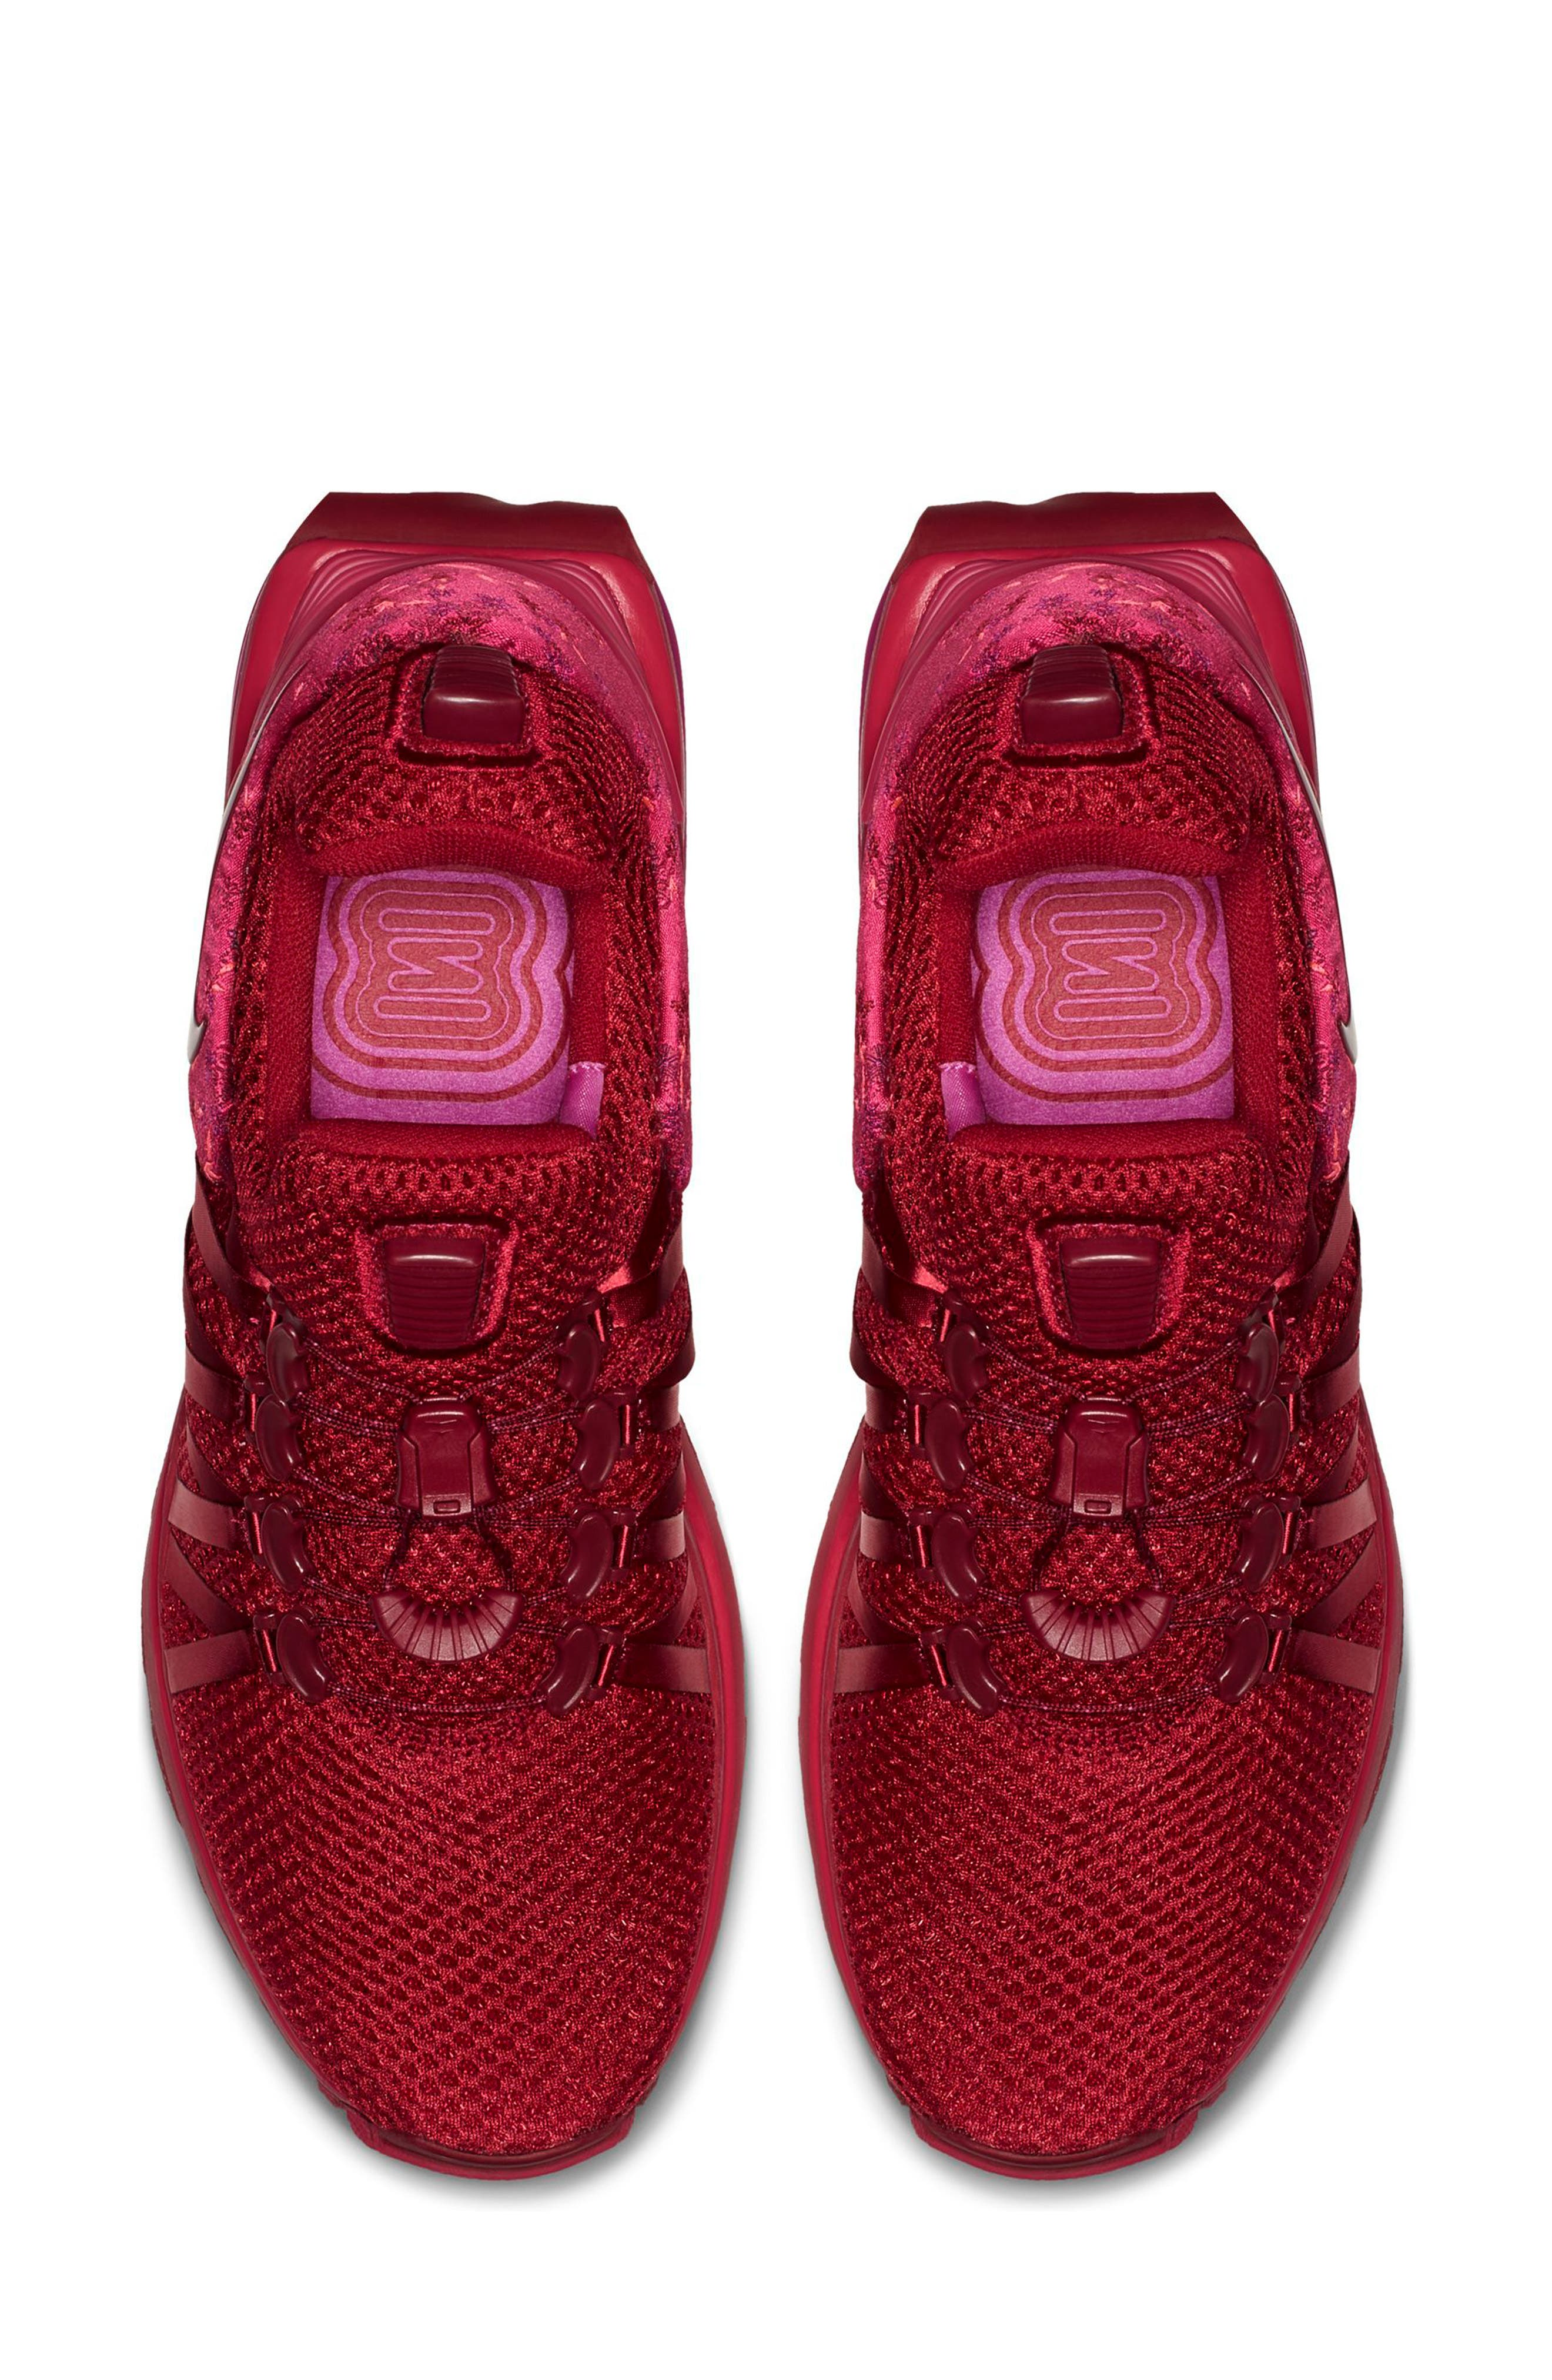 Shox Gravity Sneaker,                             Alternate thumbnail 11, color,